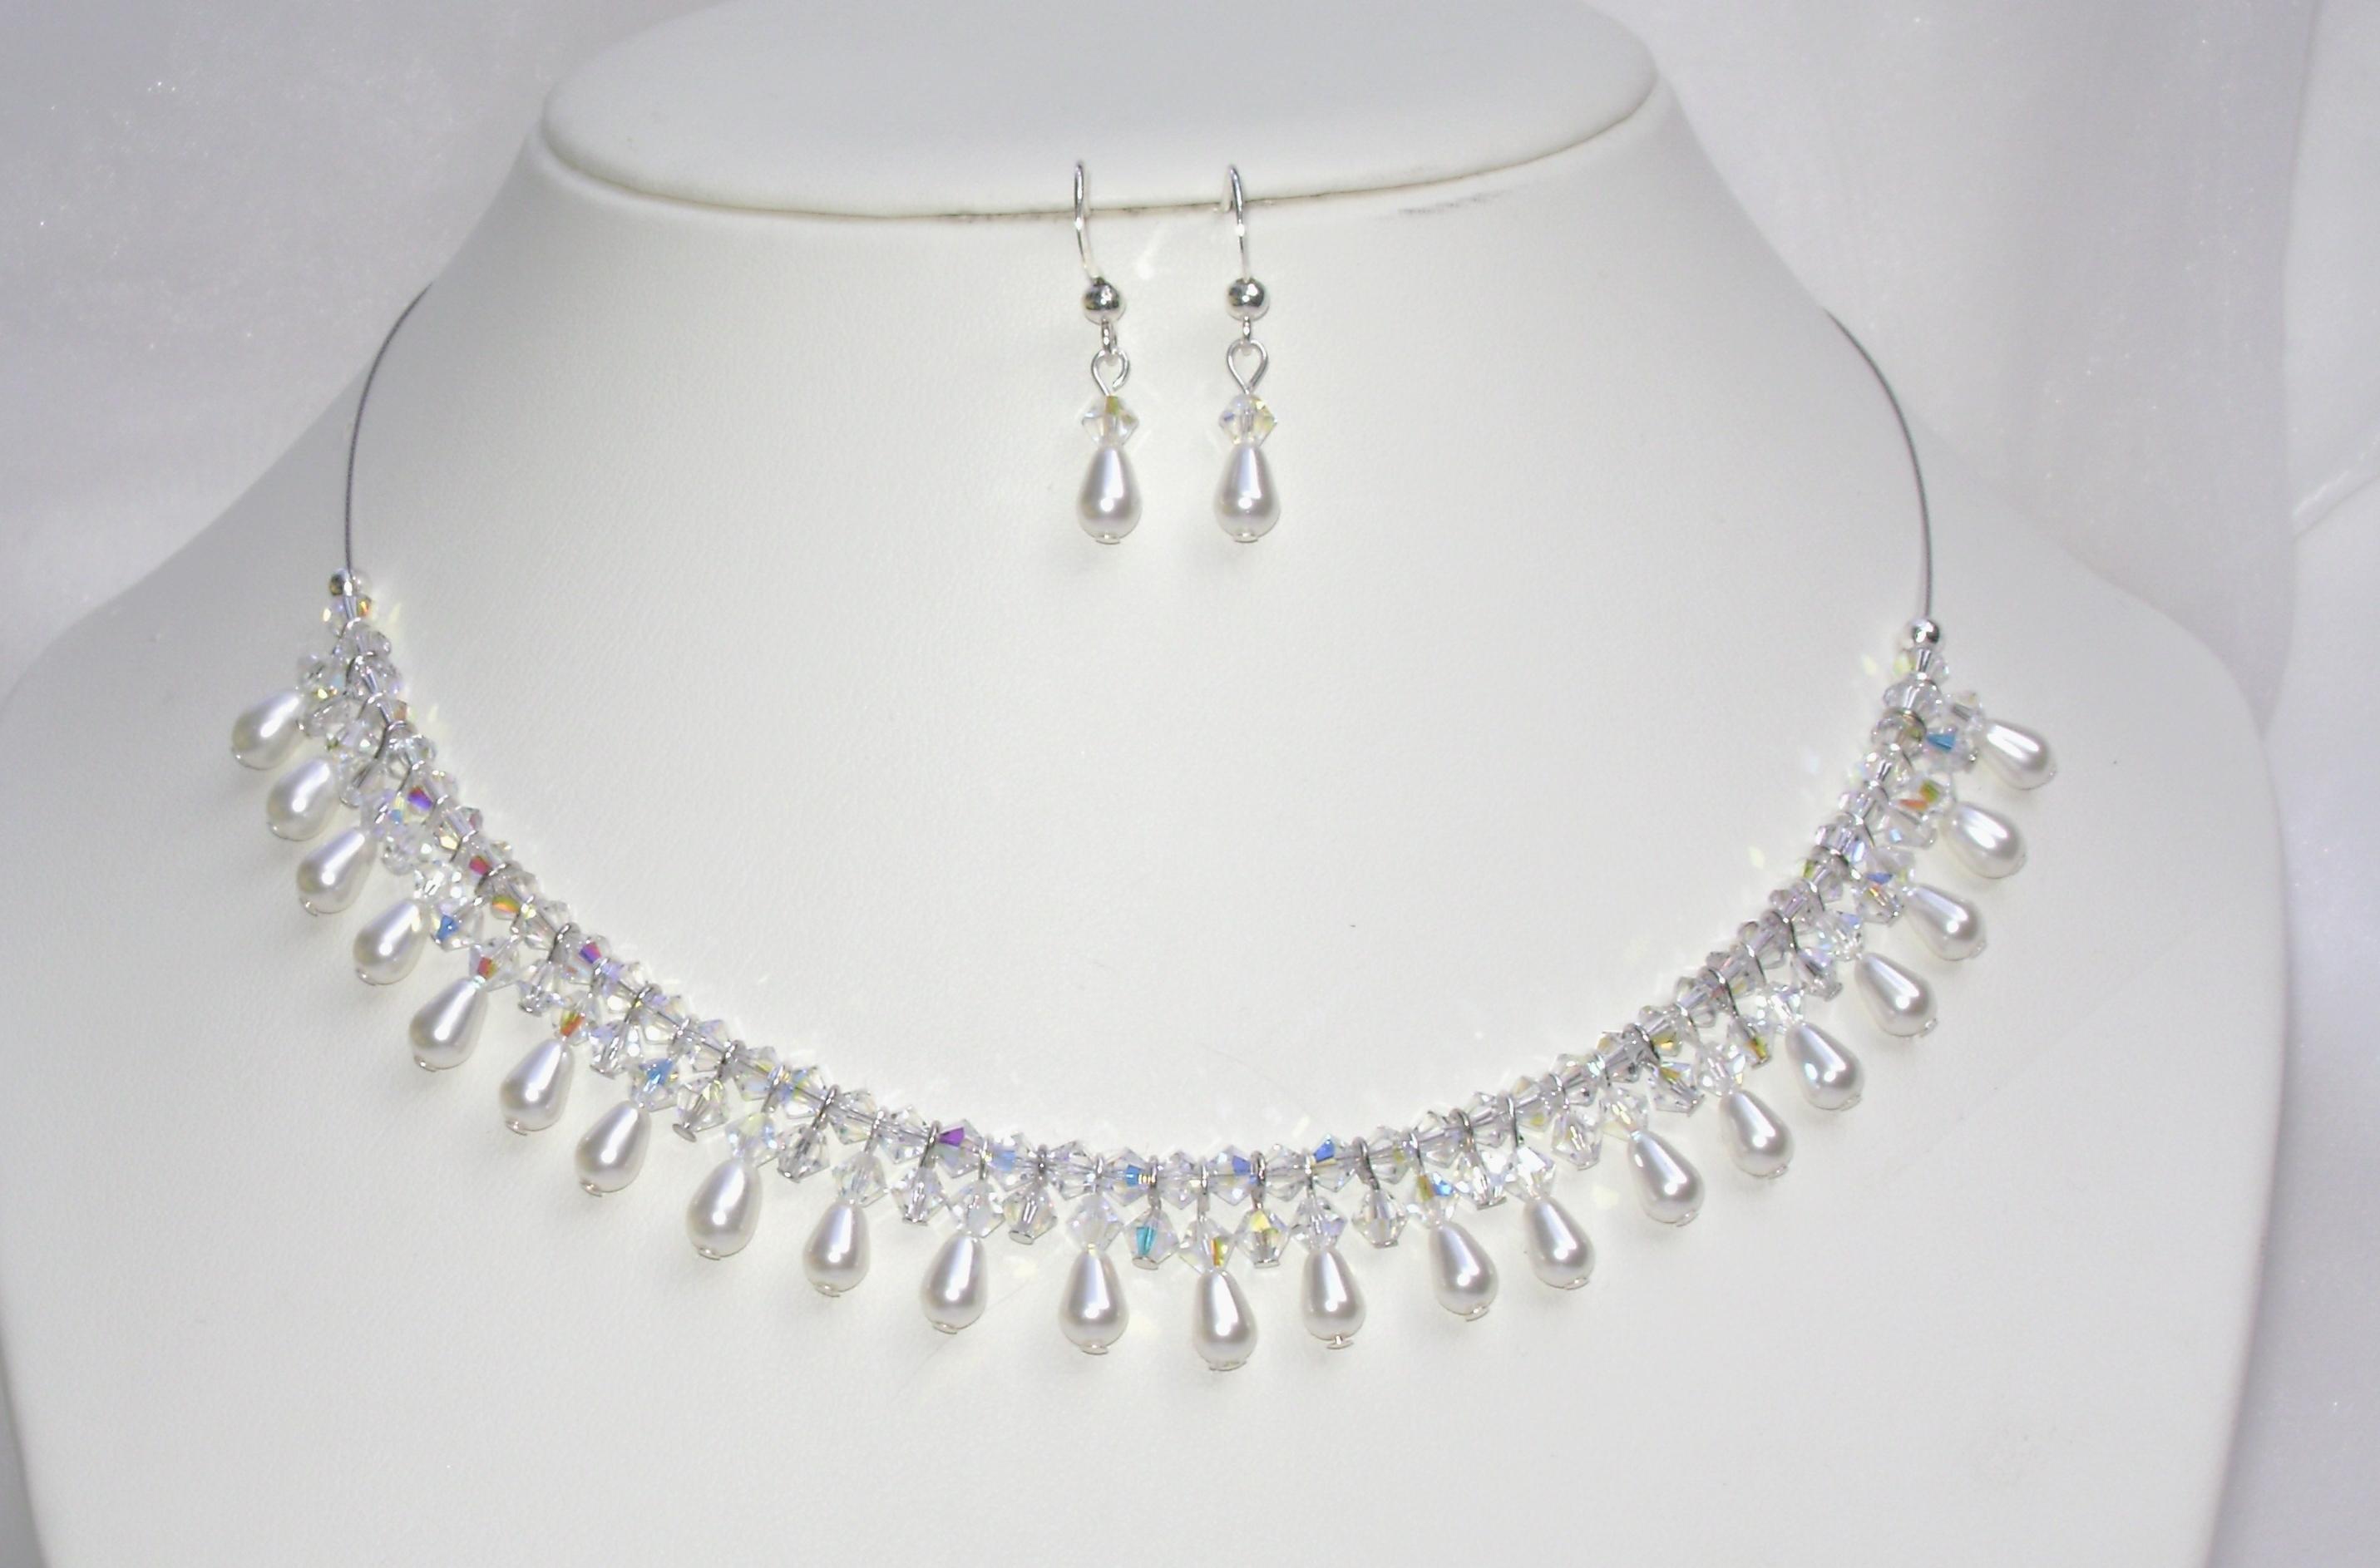 Vintage, Necklace, Pearl, Jewellery, Gemma holmes